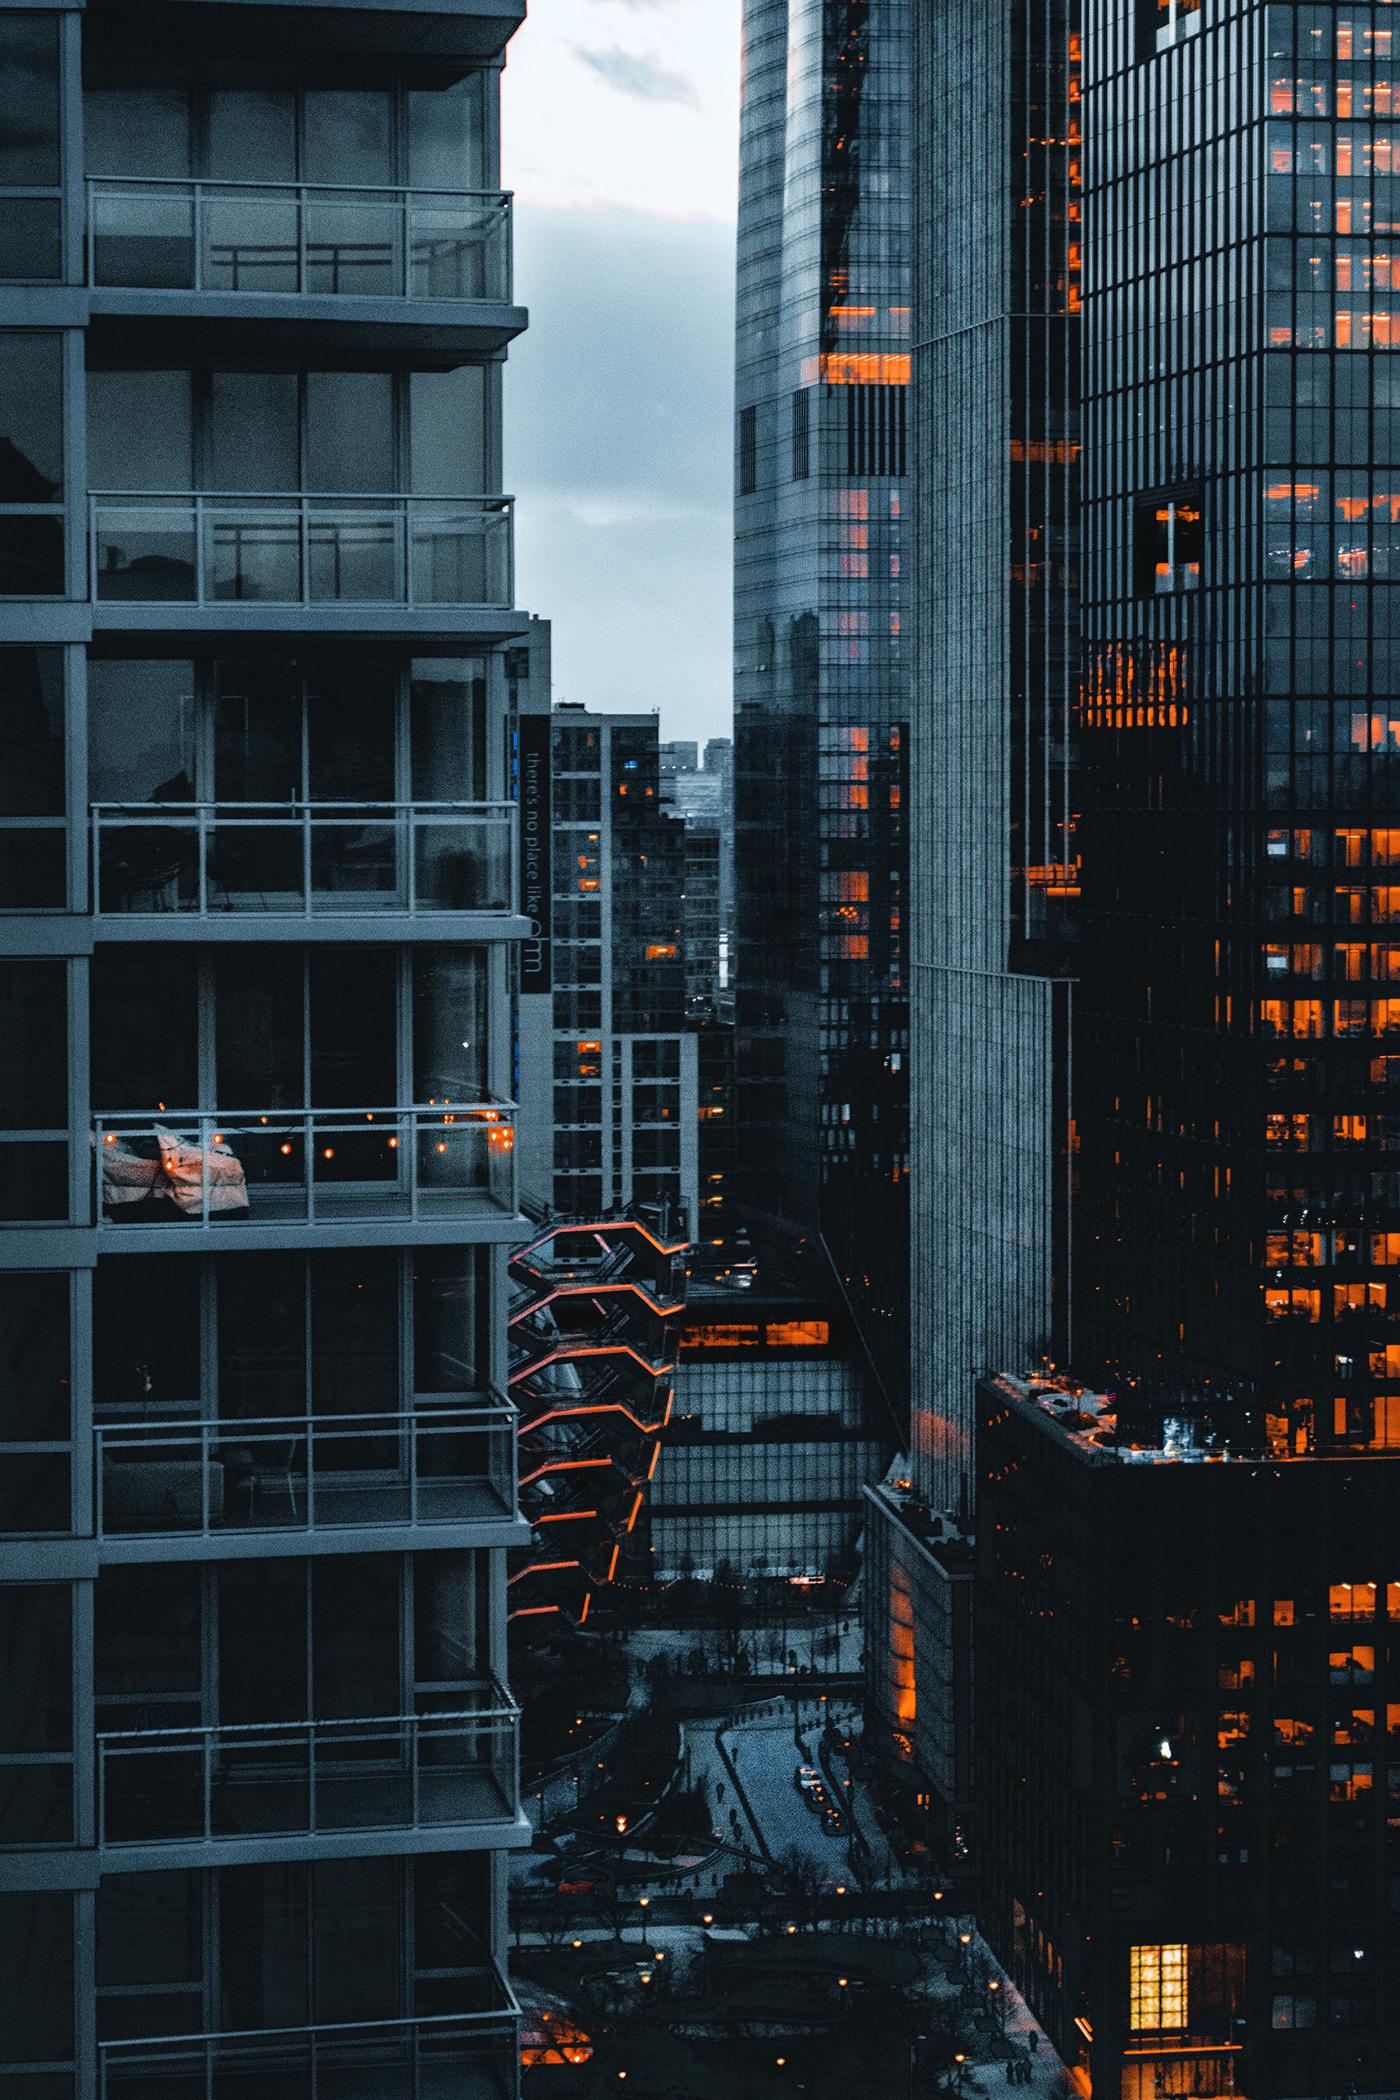 architecture city Hudson Yards New York new york city nyc The Vessel